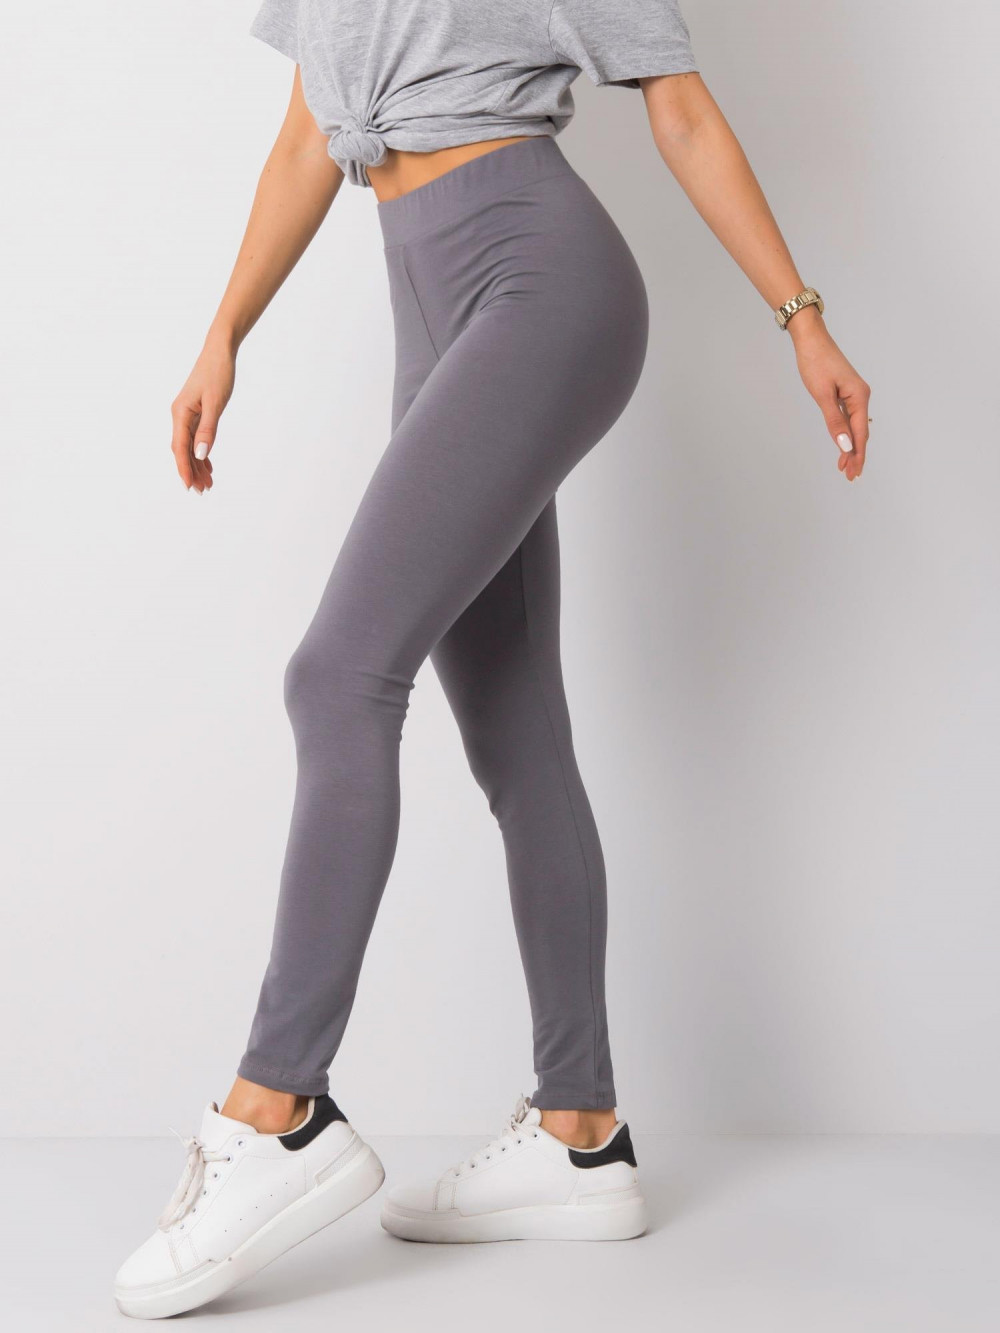 Jasnoszare legginsy fitness Prime 3